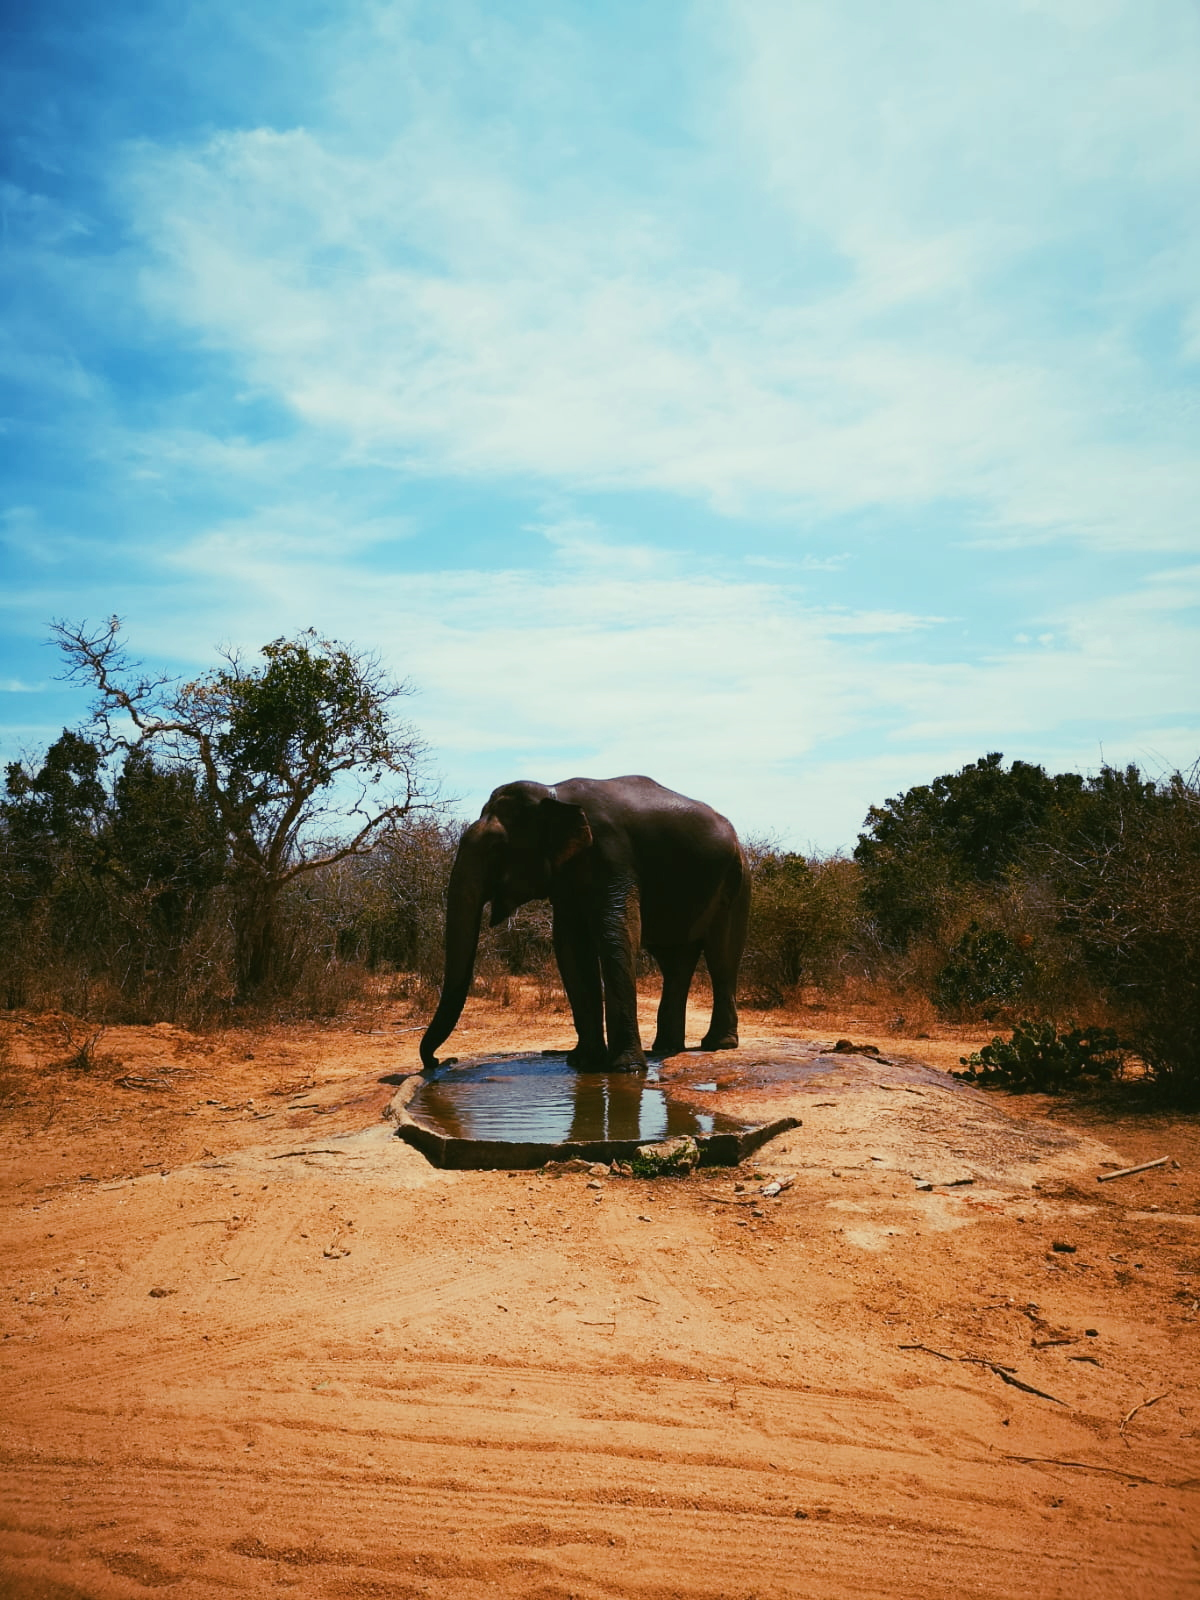 invite-to-paradise-sri-lanka-holiday-honeymoon-specialists-customer-feedback-elin-jordan-luce-yala-beach-wild-elephant.JPG